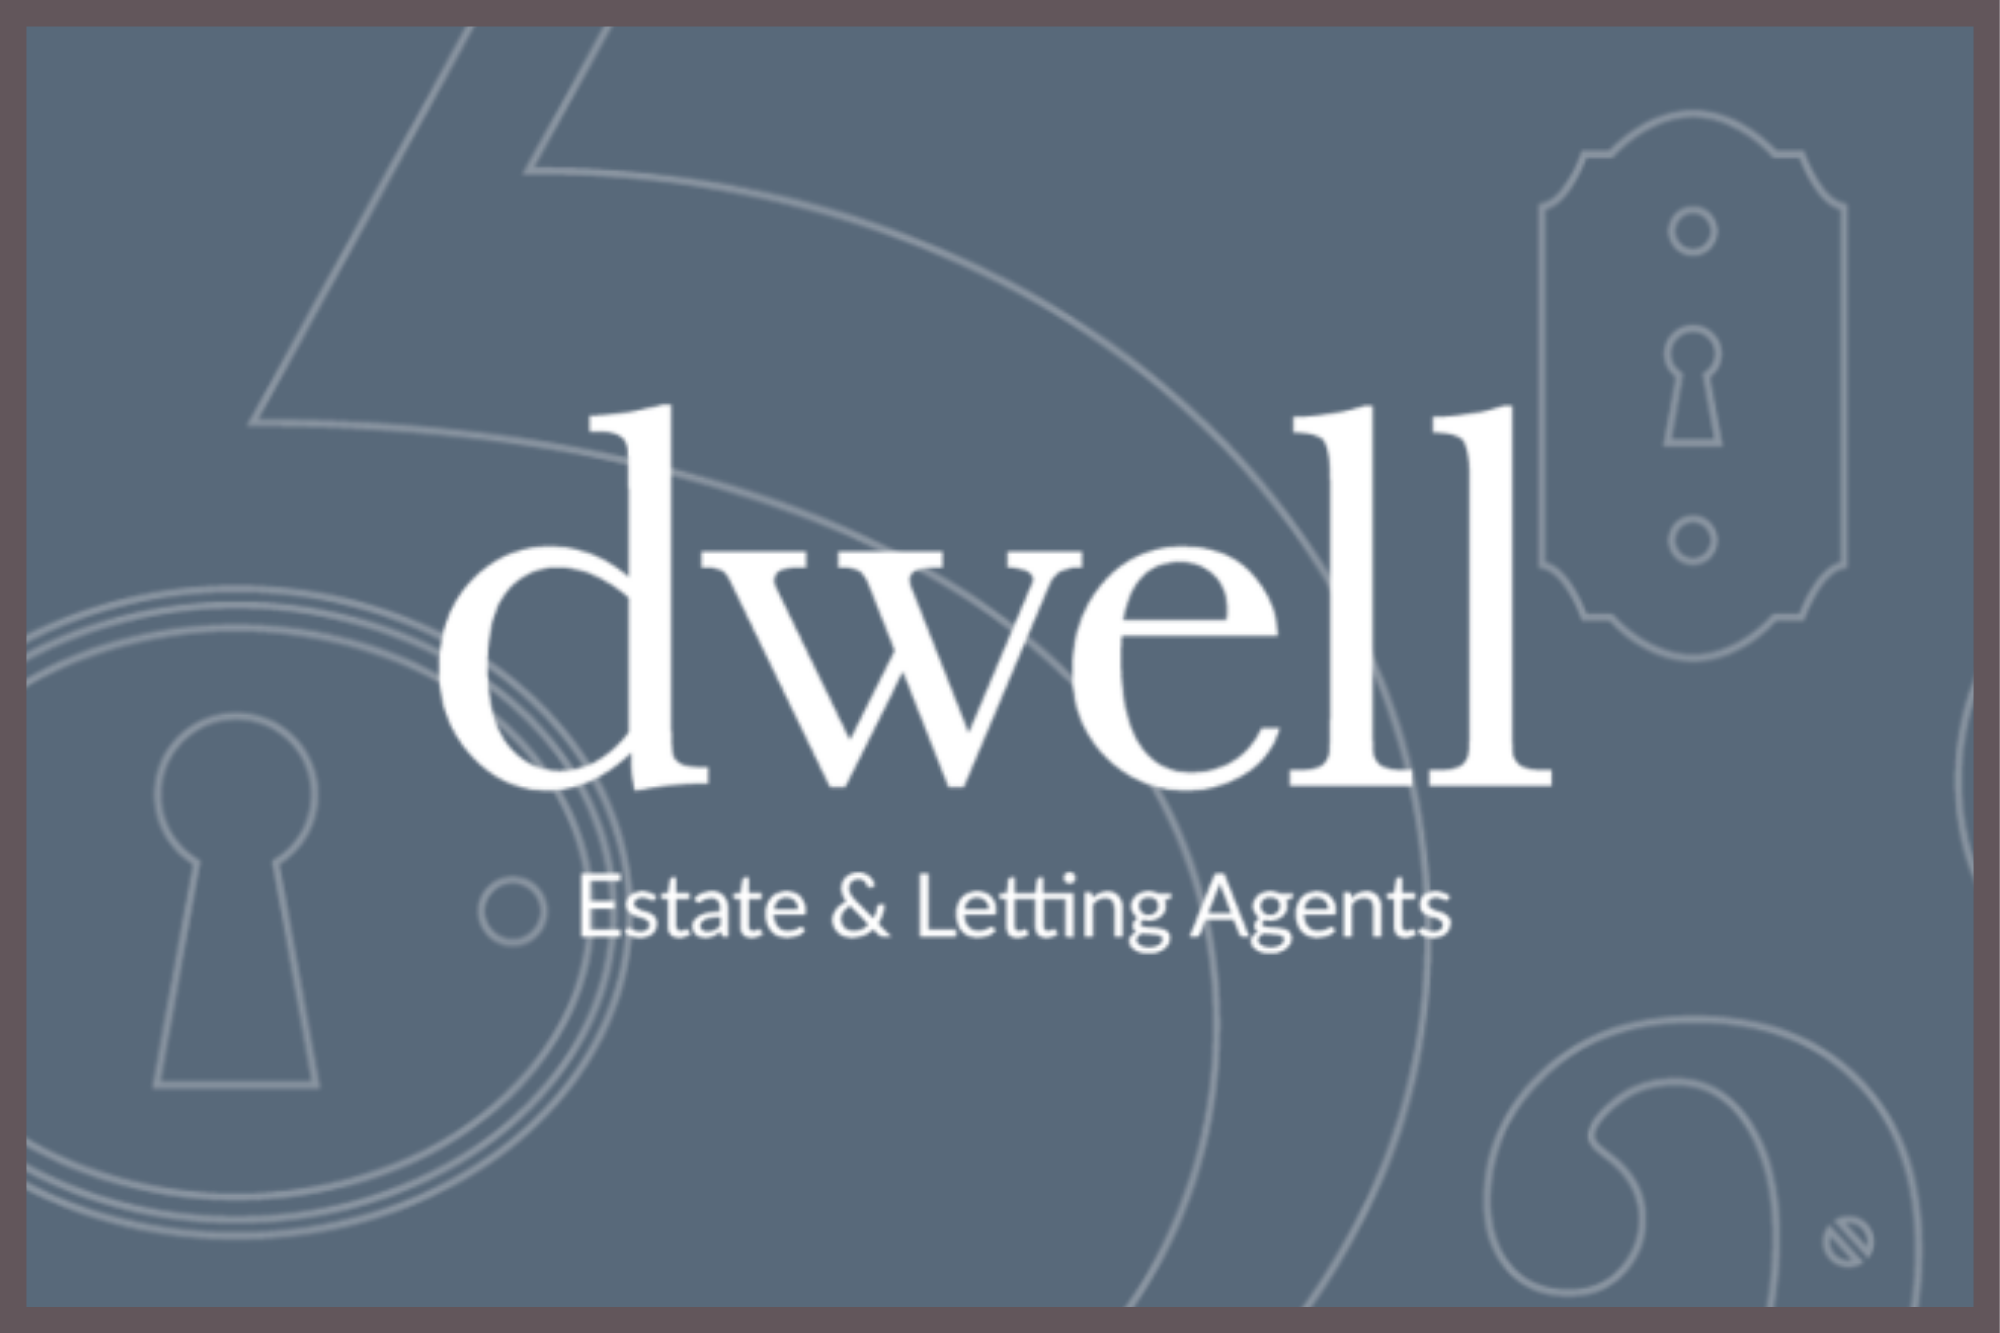 Dwell HMO Lettings